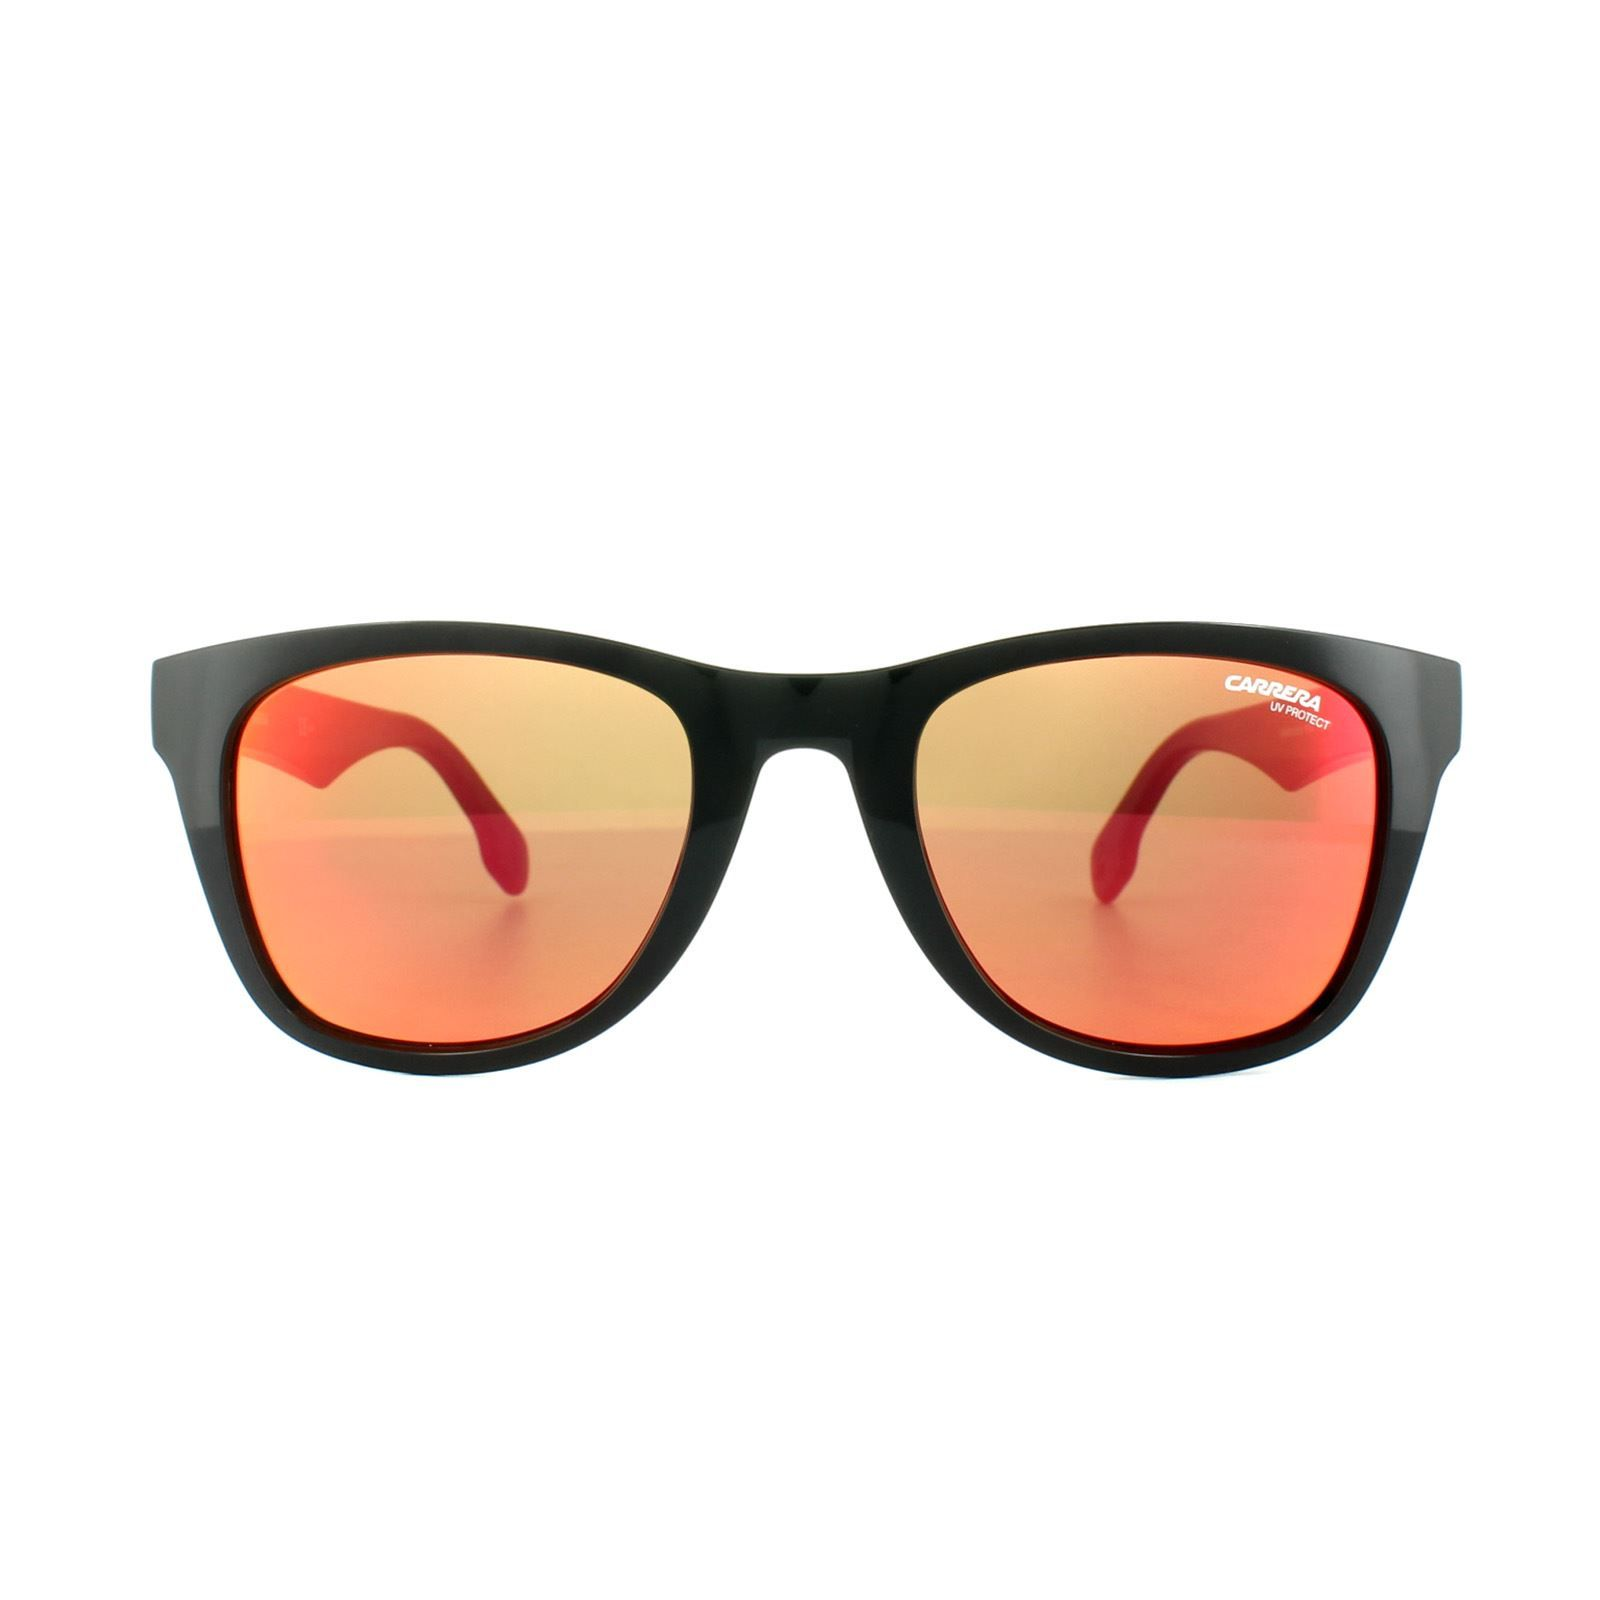 Carrera Sunglasses Carrera 5038/S PPR UZ Black Red Mirror